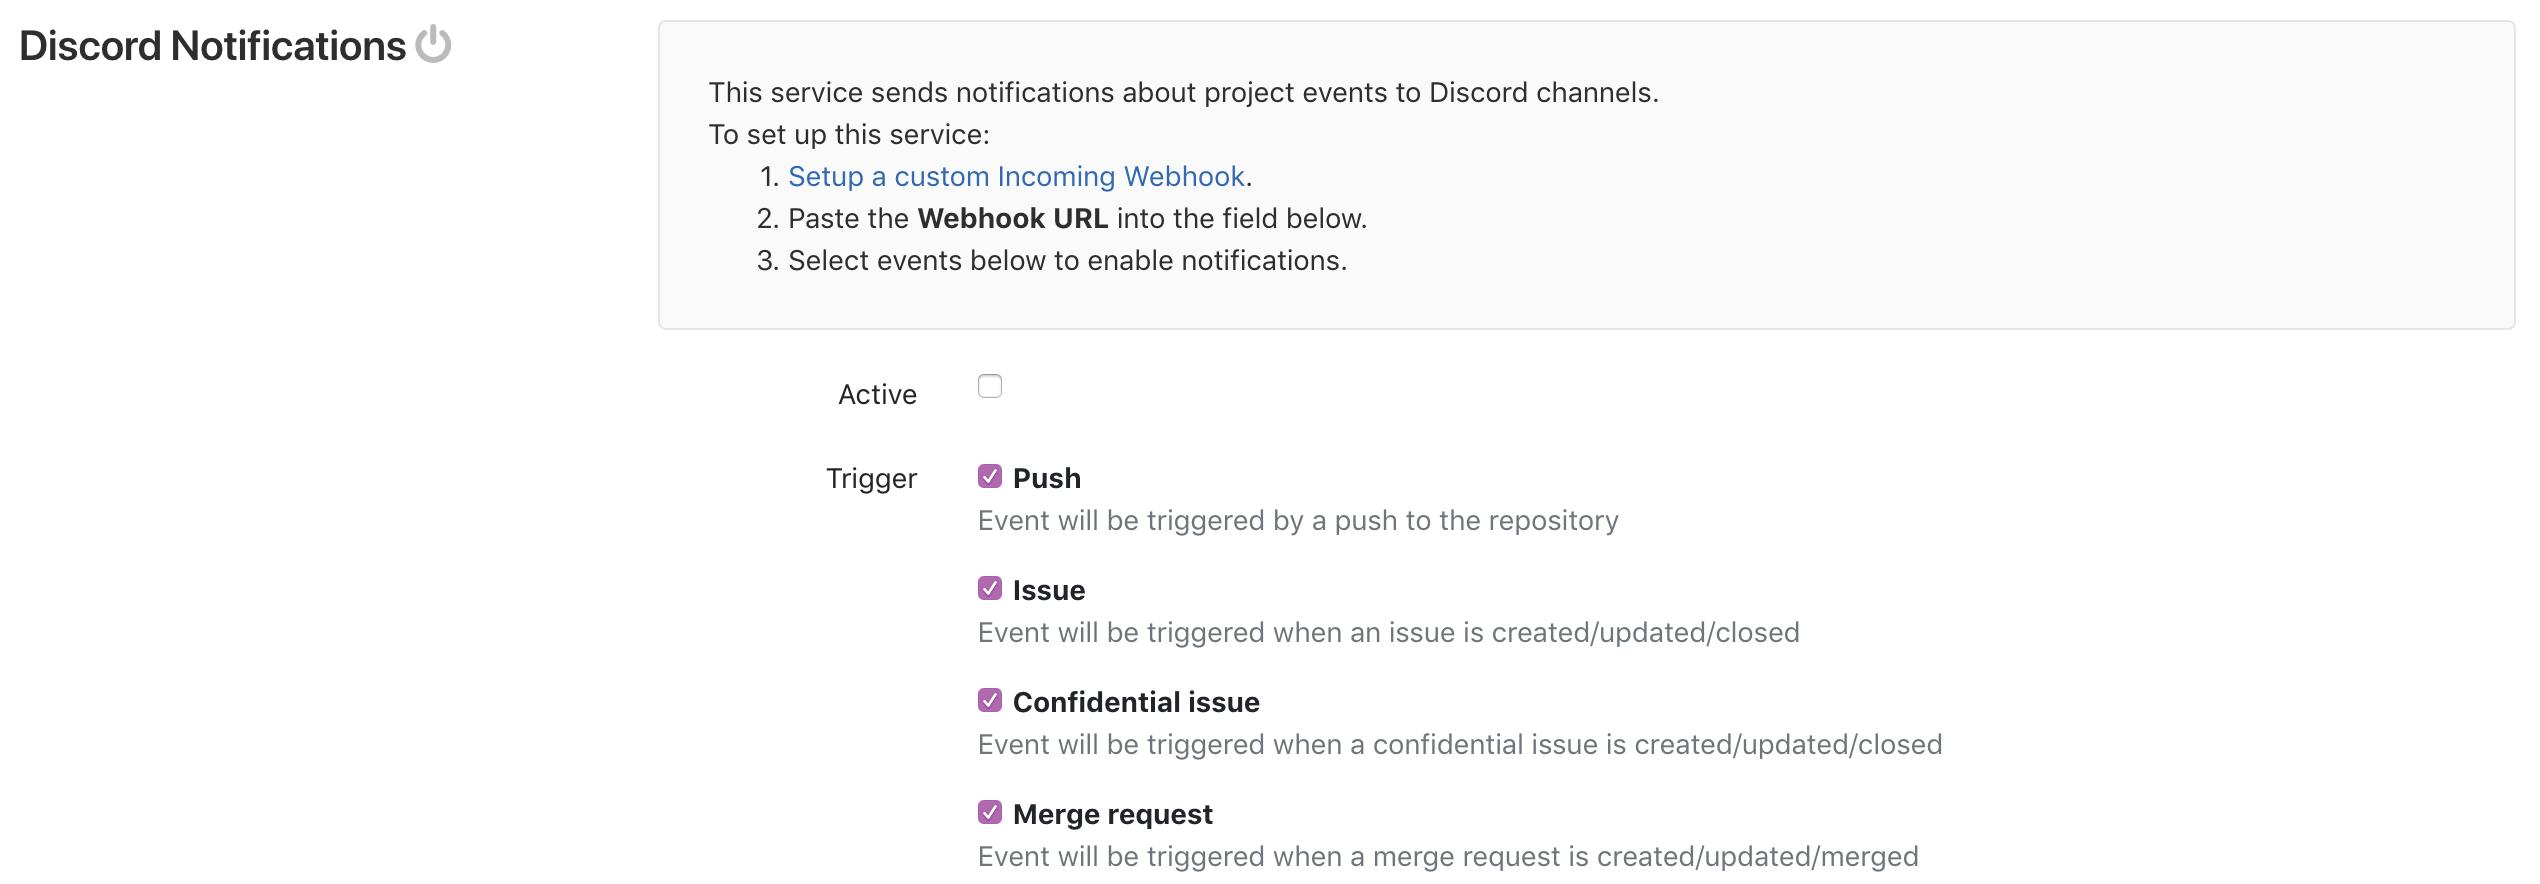 Discord notifications